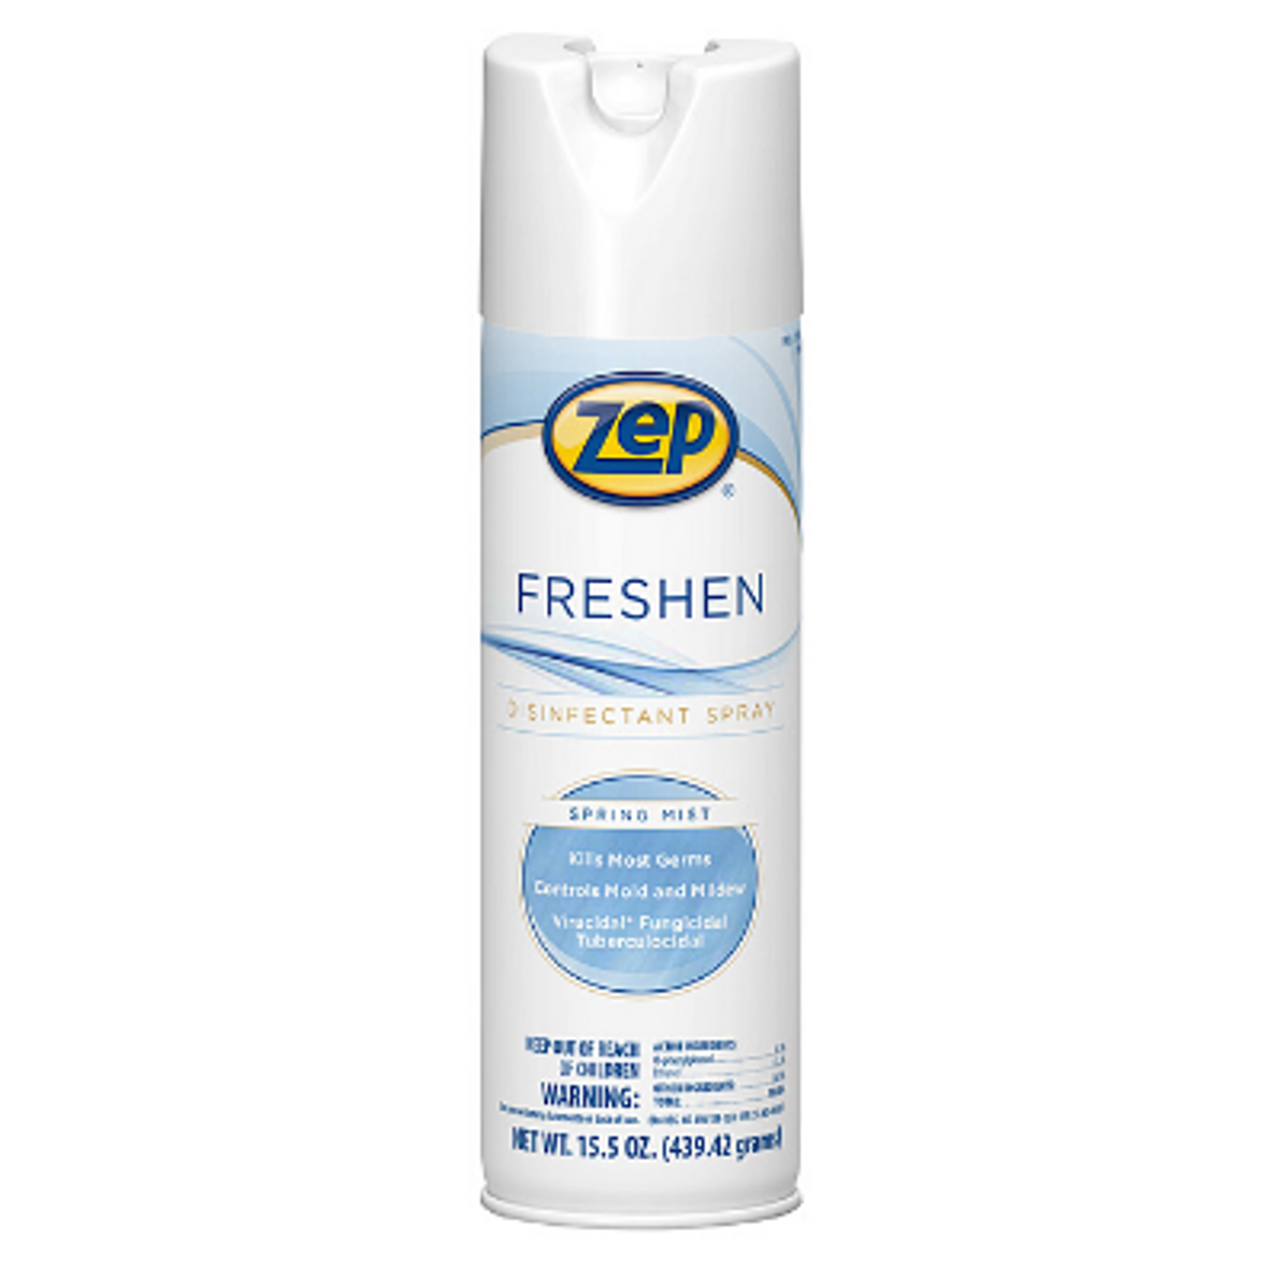 Zep Freshen Disinfectant Spray, 15.5 oz, Aerosol Can, Fresh Linen